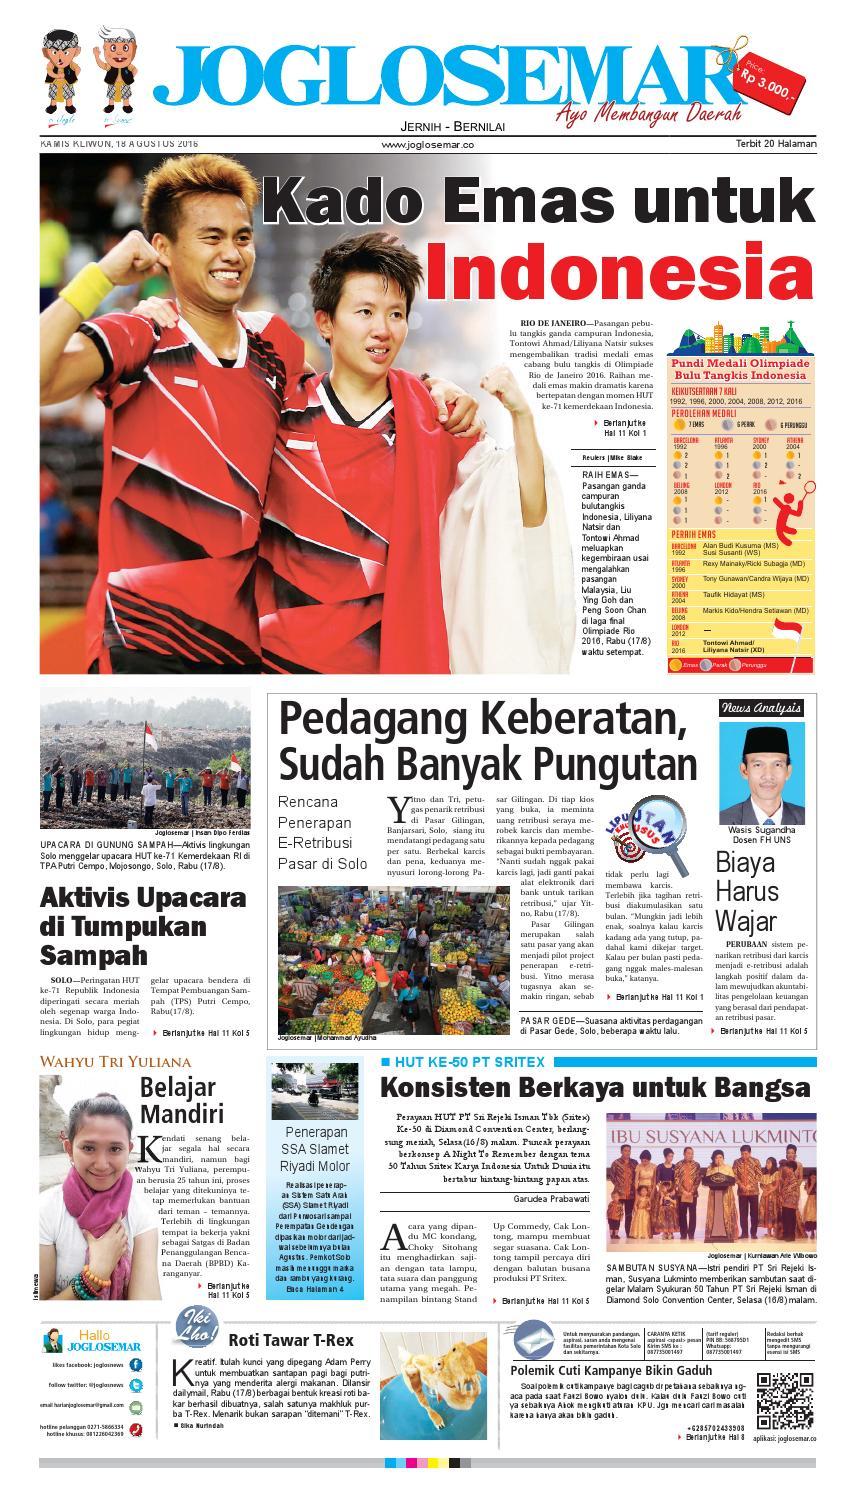 E paper 18 agustus 2016 by PT Joglosemar Prima Media - issuu 2665f99f4b